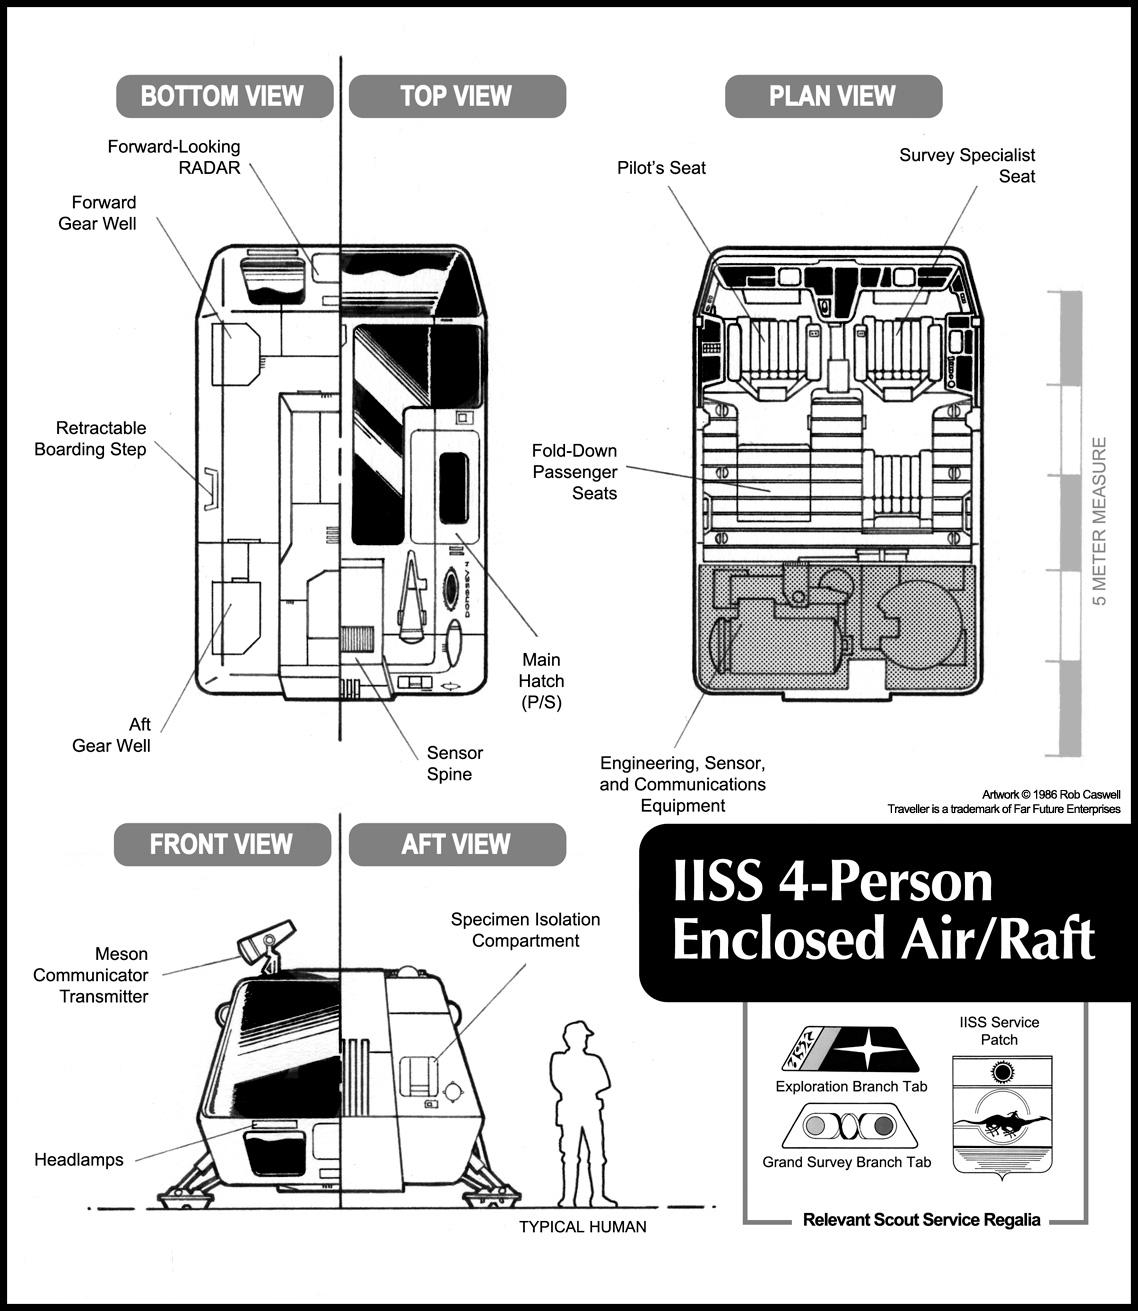 Enclosed Scout Air/Raft